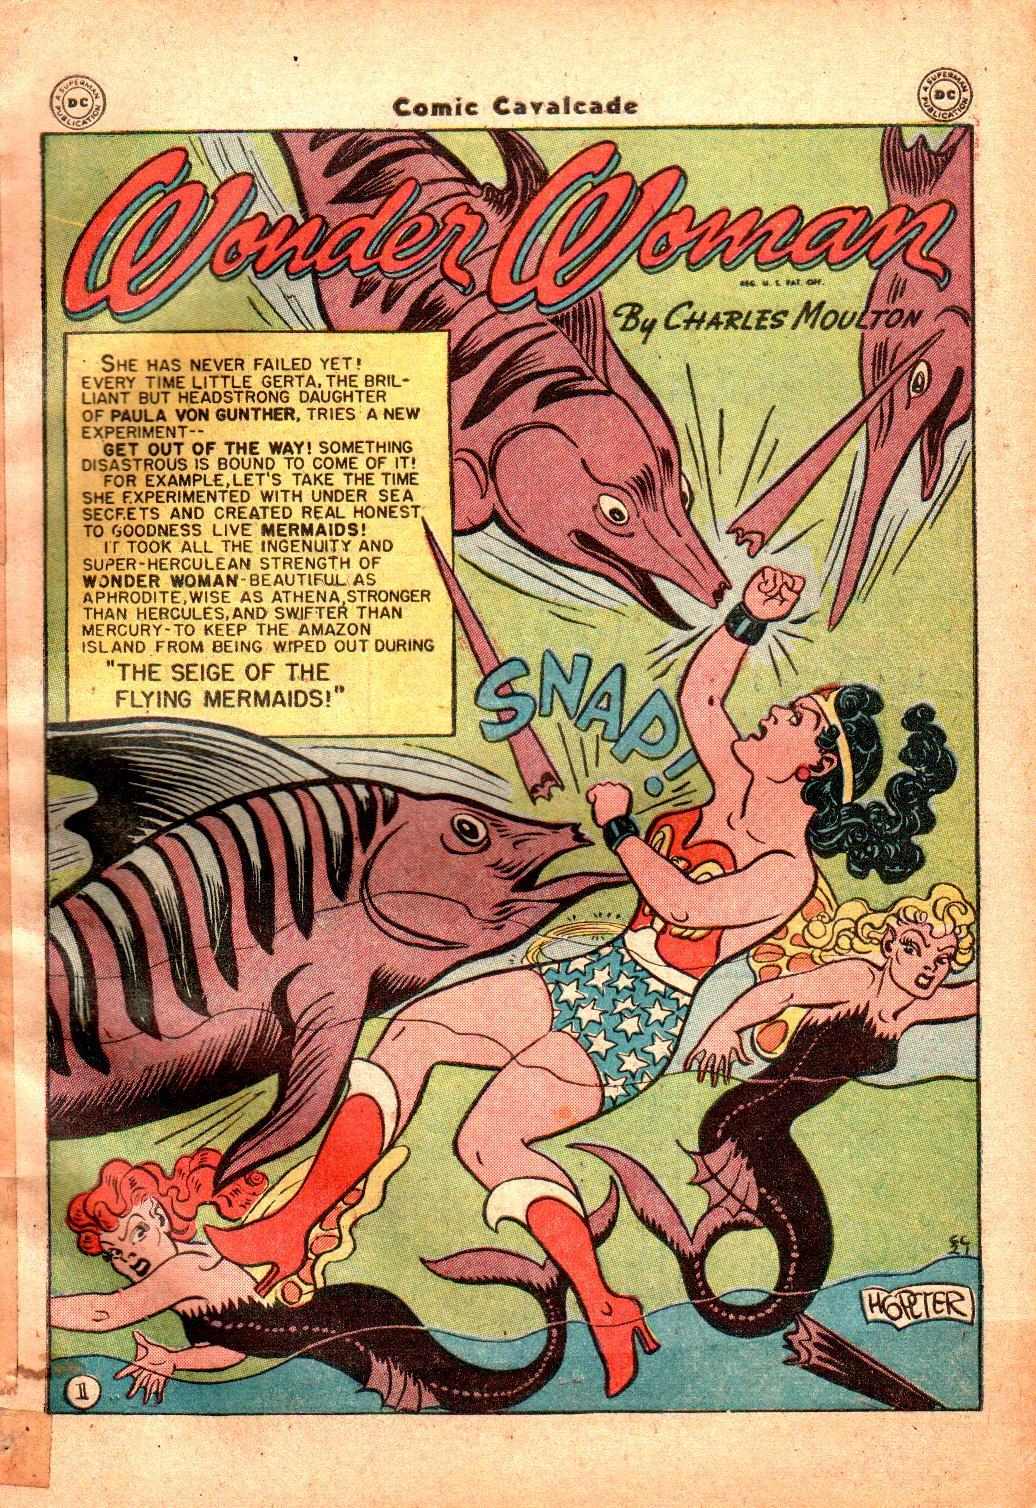 Comic Cavalcade issue 21 - Page 3